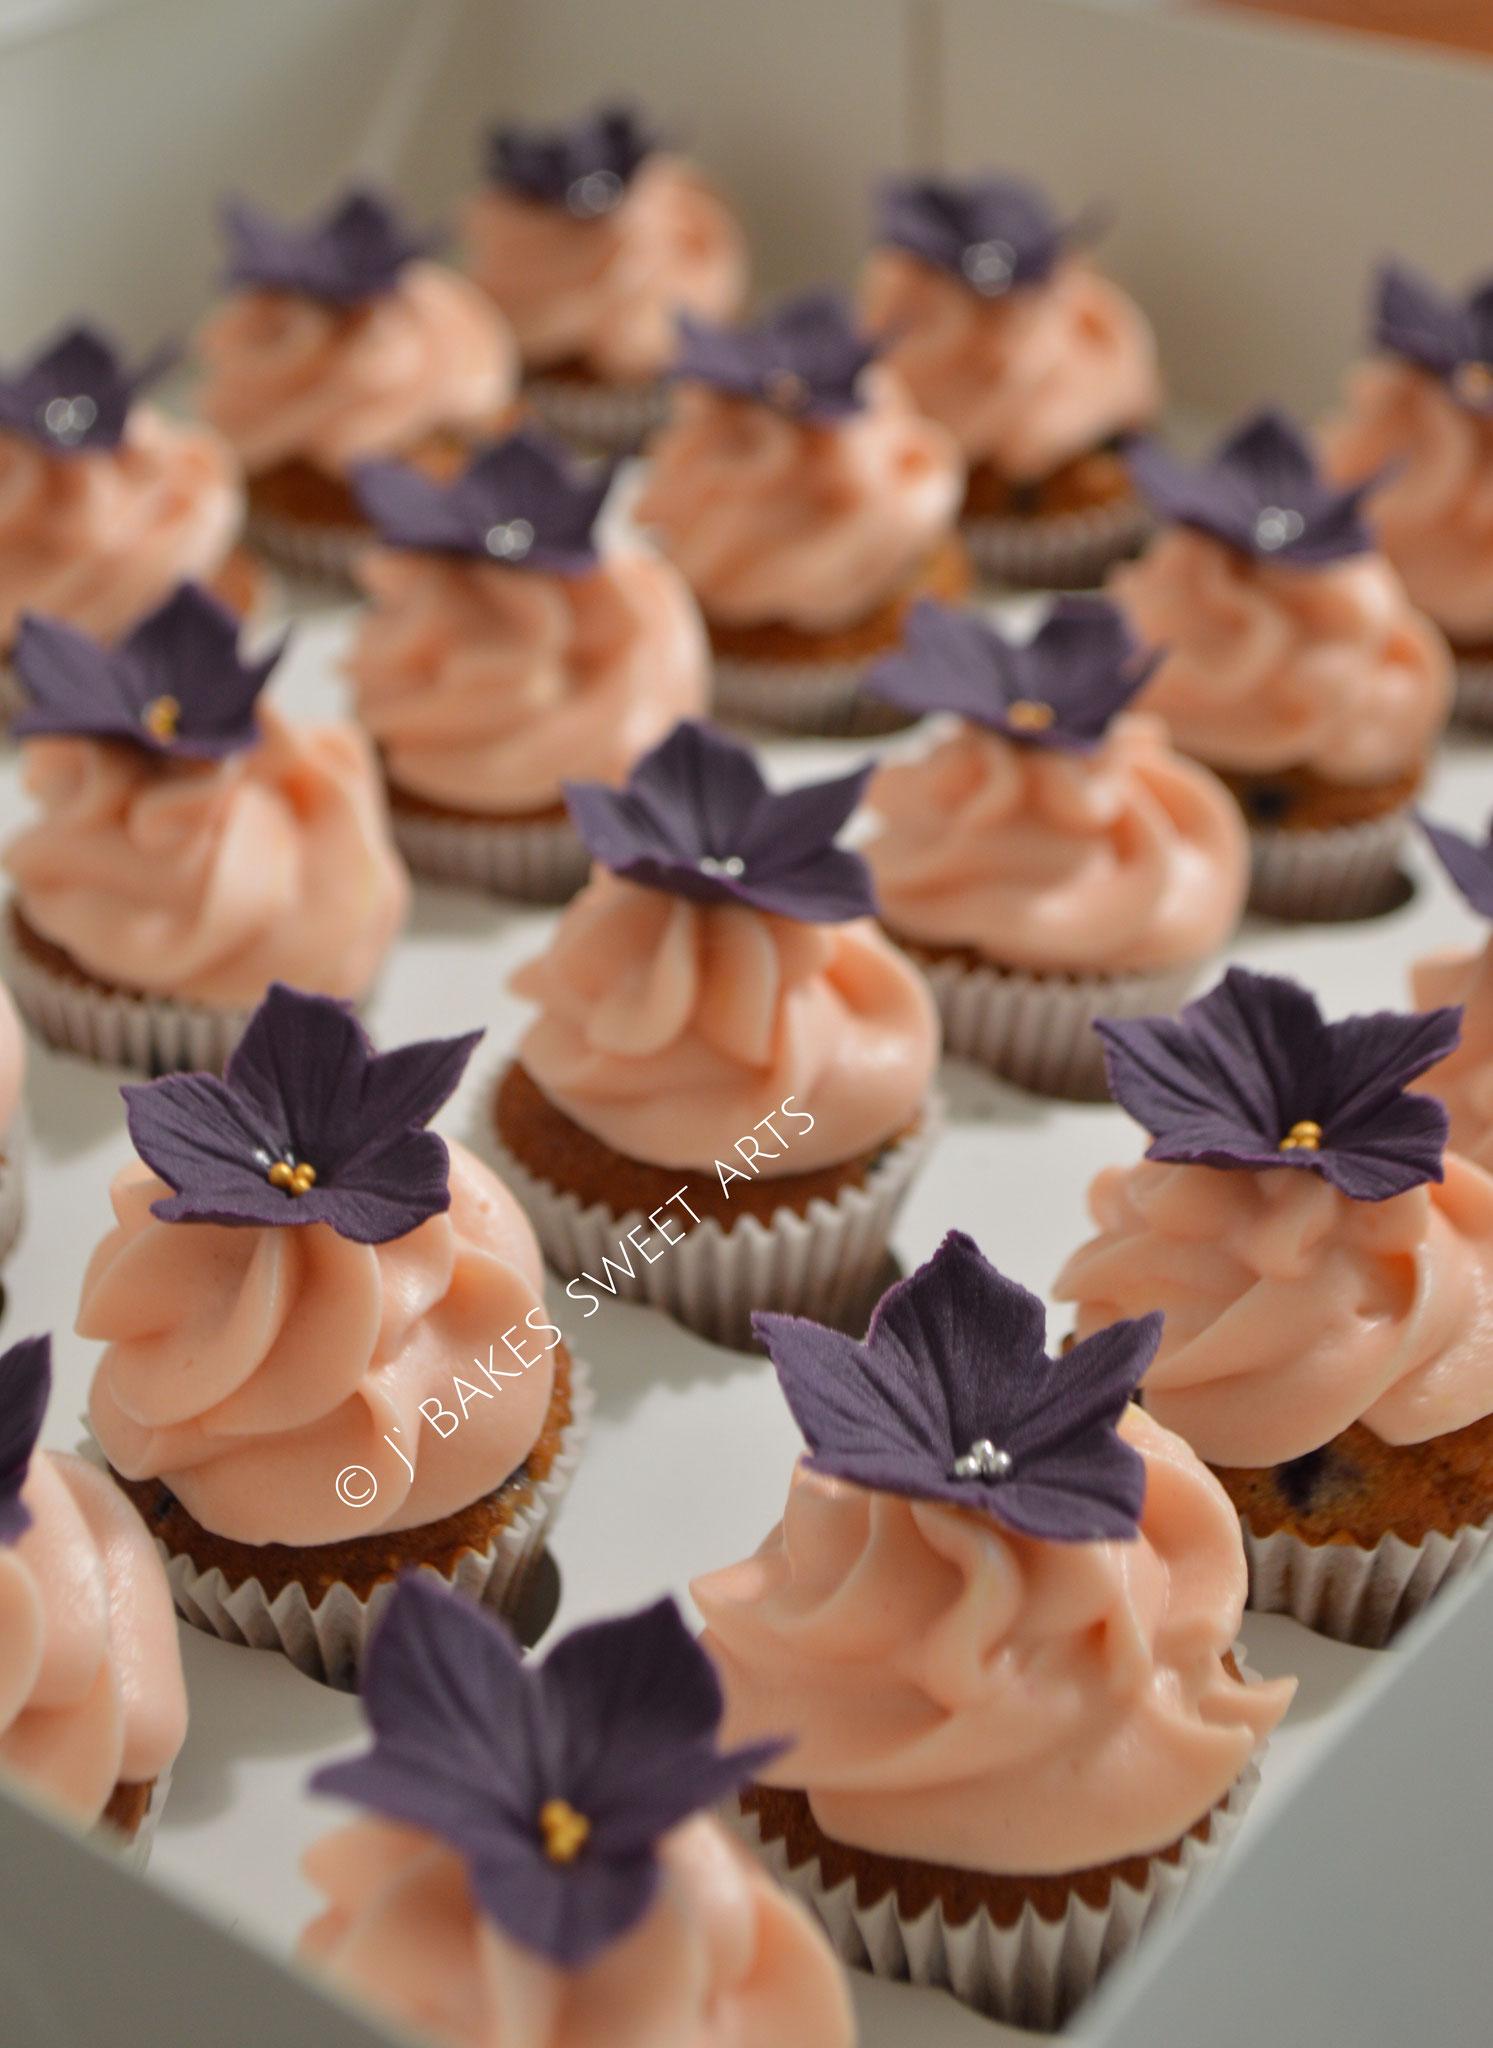 Himbeere-Mini-Cupcakes // Raspberry-Mini-Cupcakes